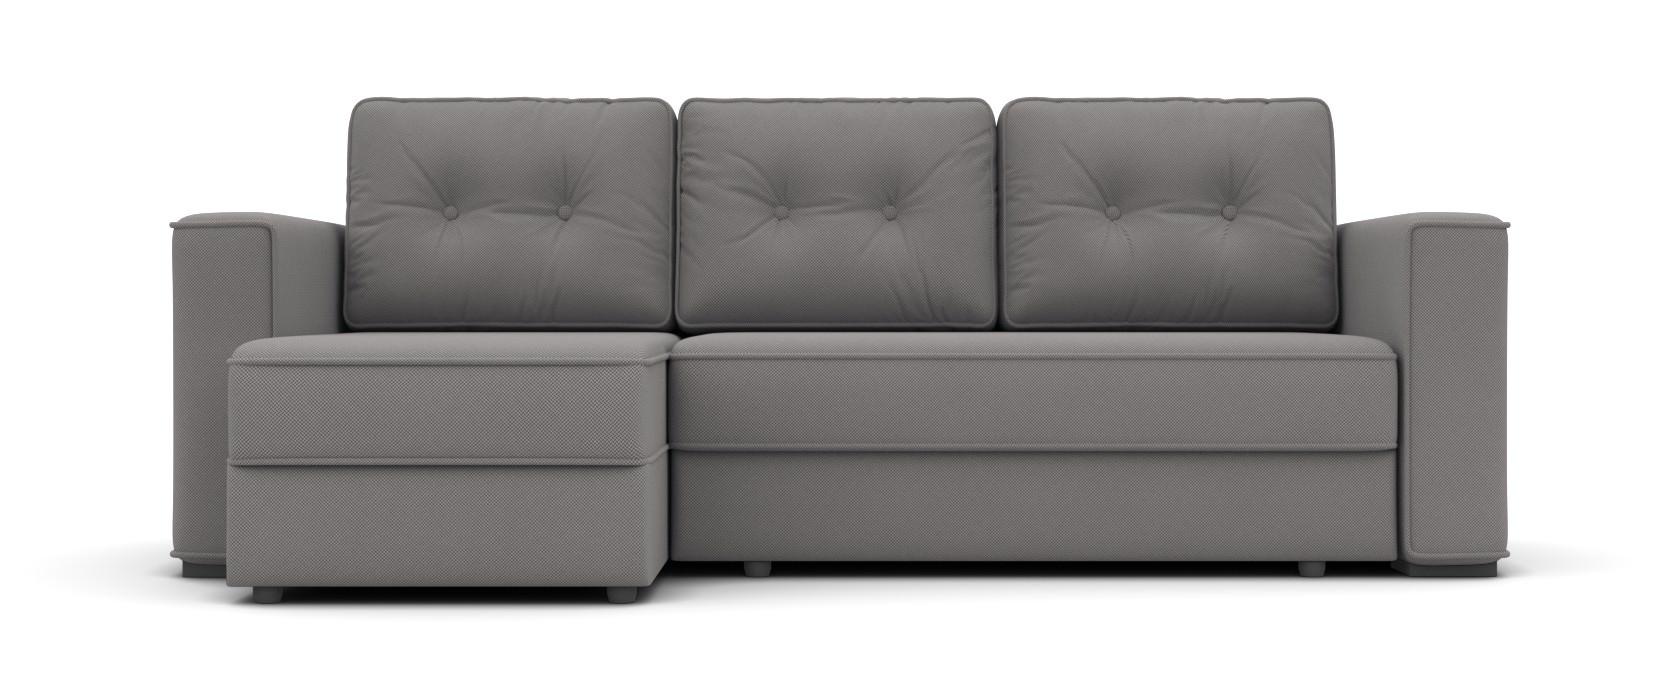 Угловой диван Silvio - Pufetto